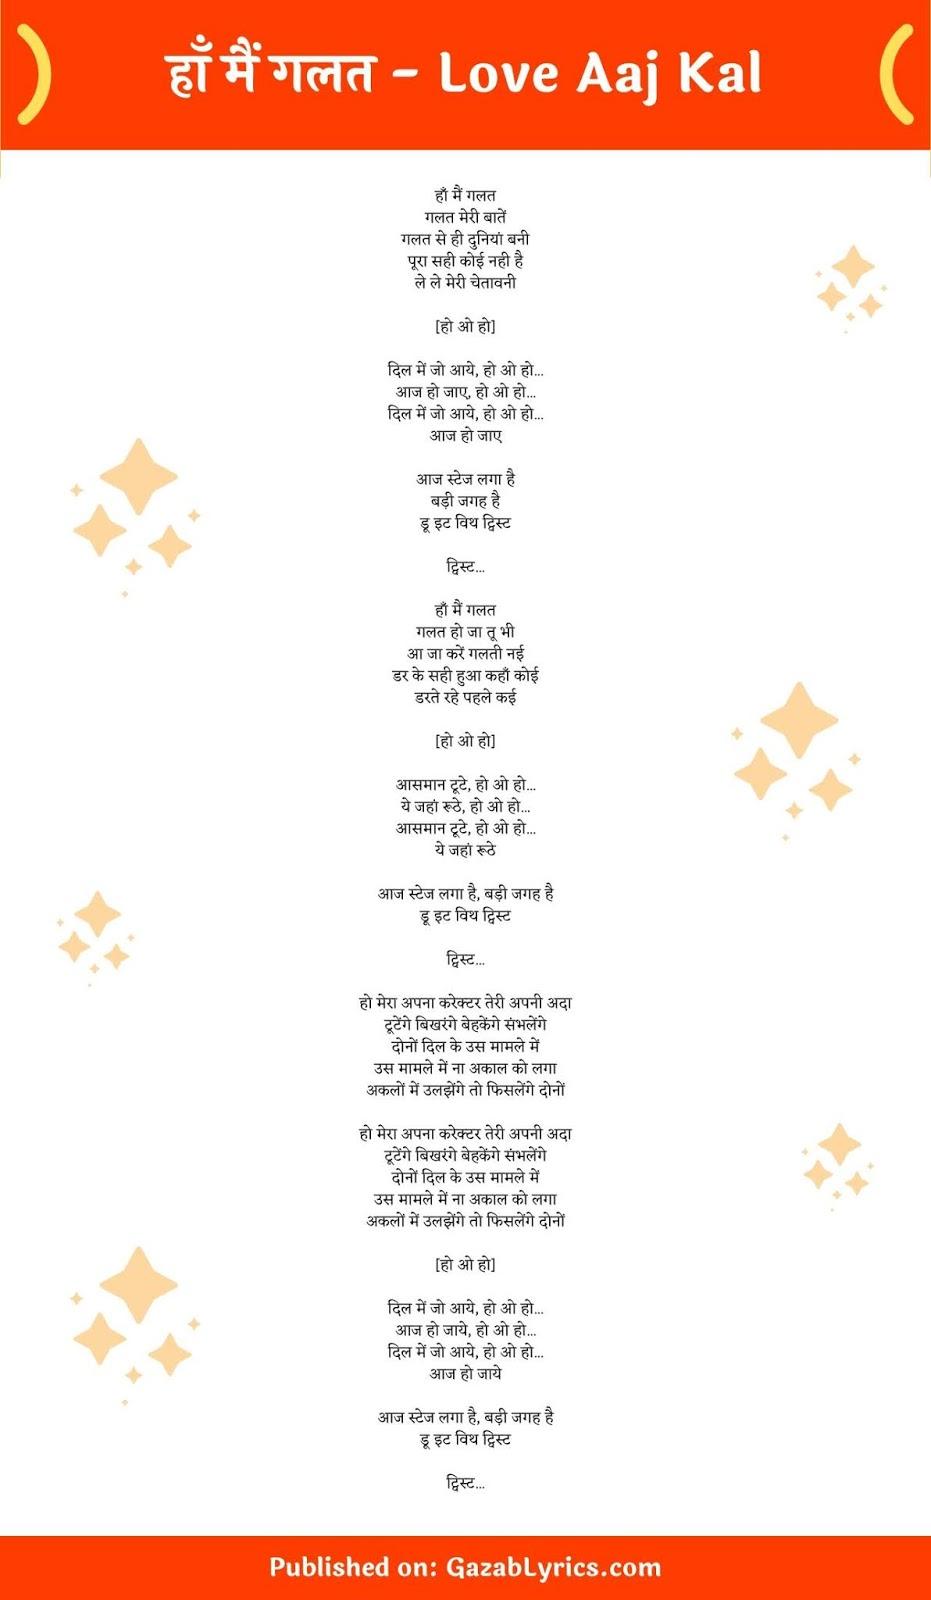 Haan Main Galat song lyrics image